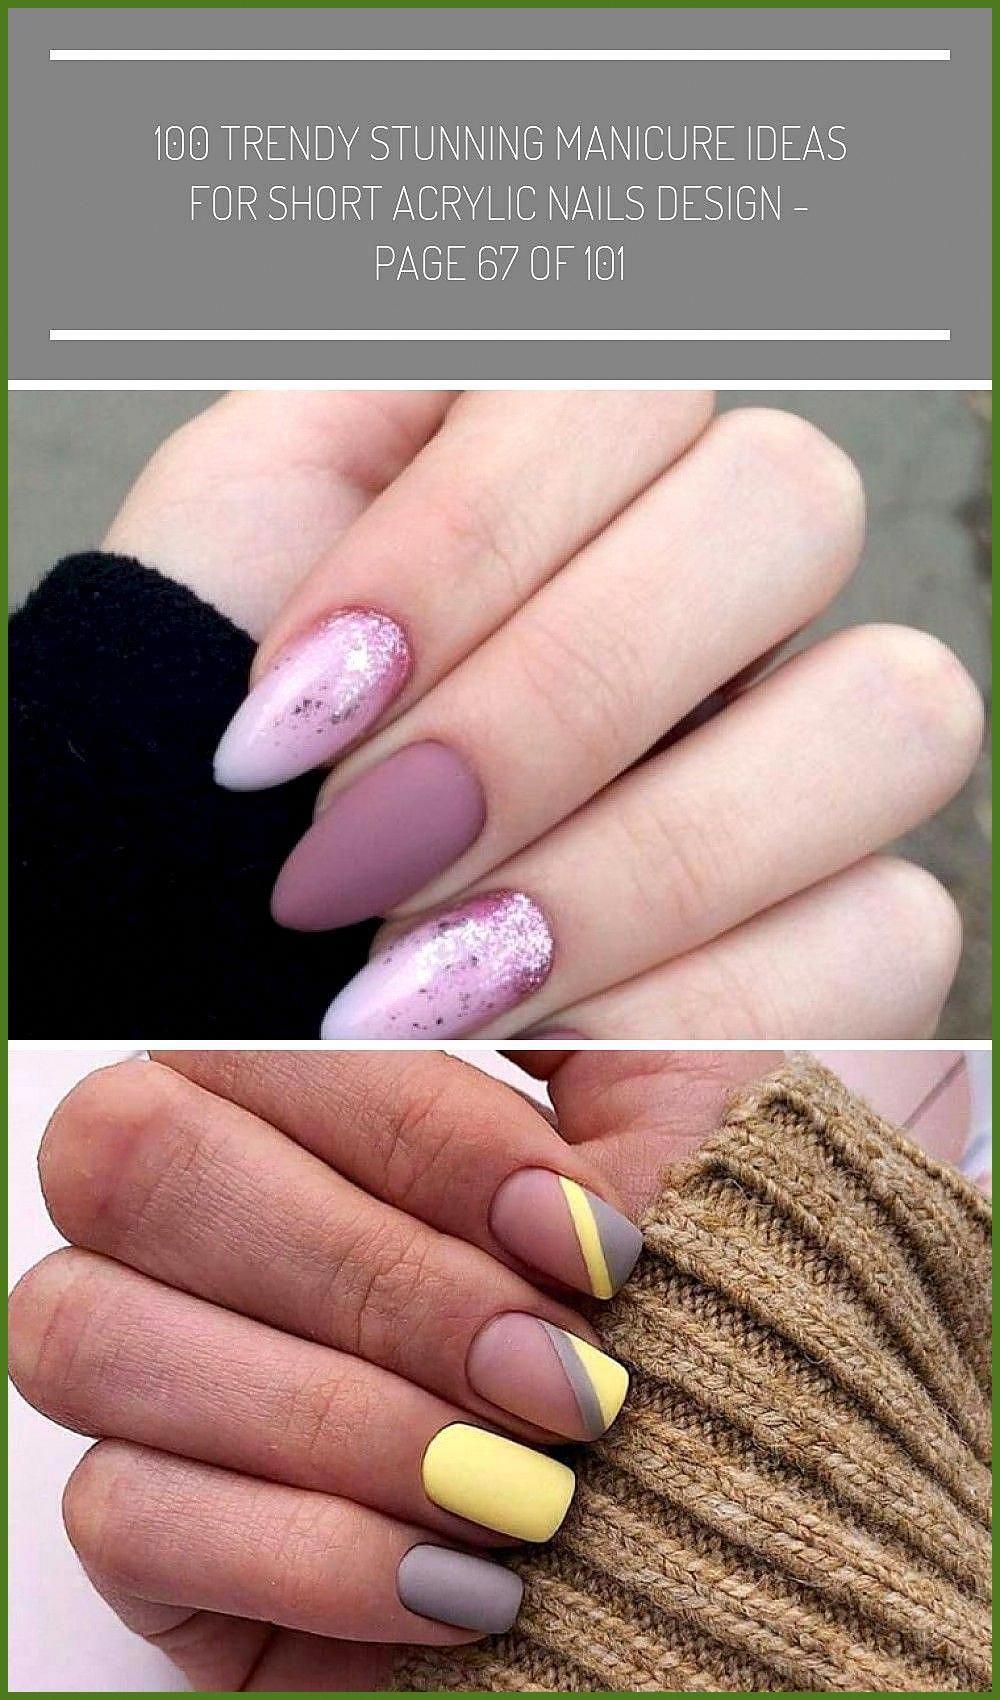 Acrylic Almond Nails Short Almond Nails Long Almond Nails 2019 Natural Almond Nails Matte Almond Nail Design In 2020 Long Almond Nails Almond Nail Natural Almond Nails